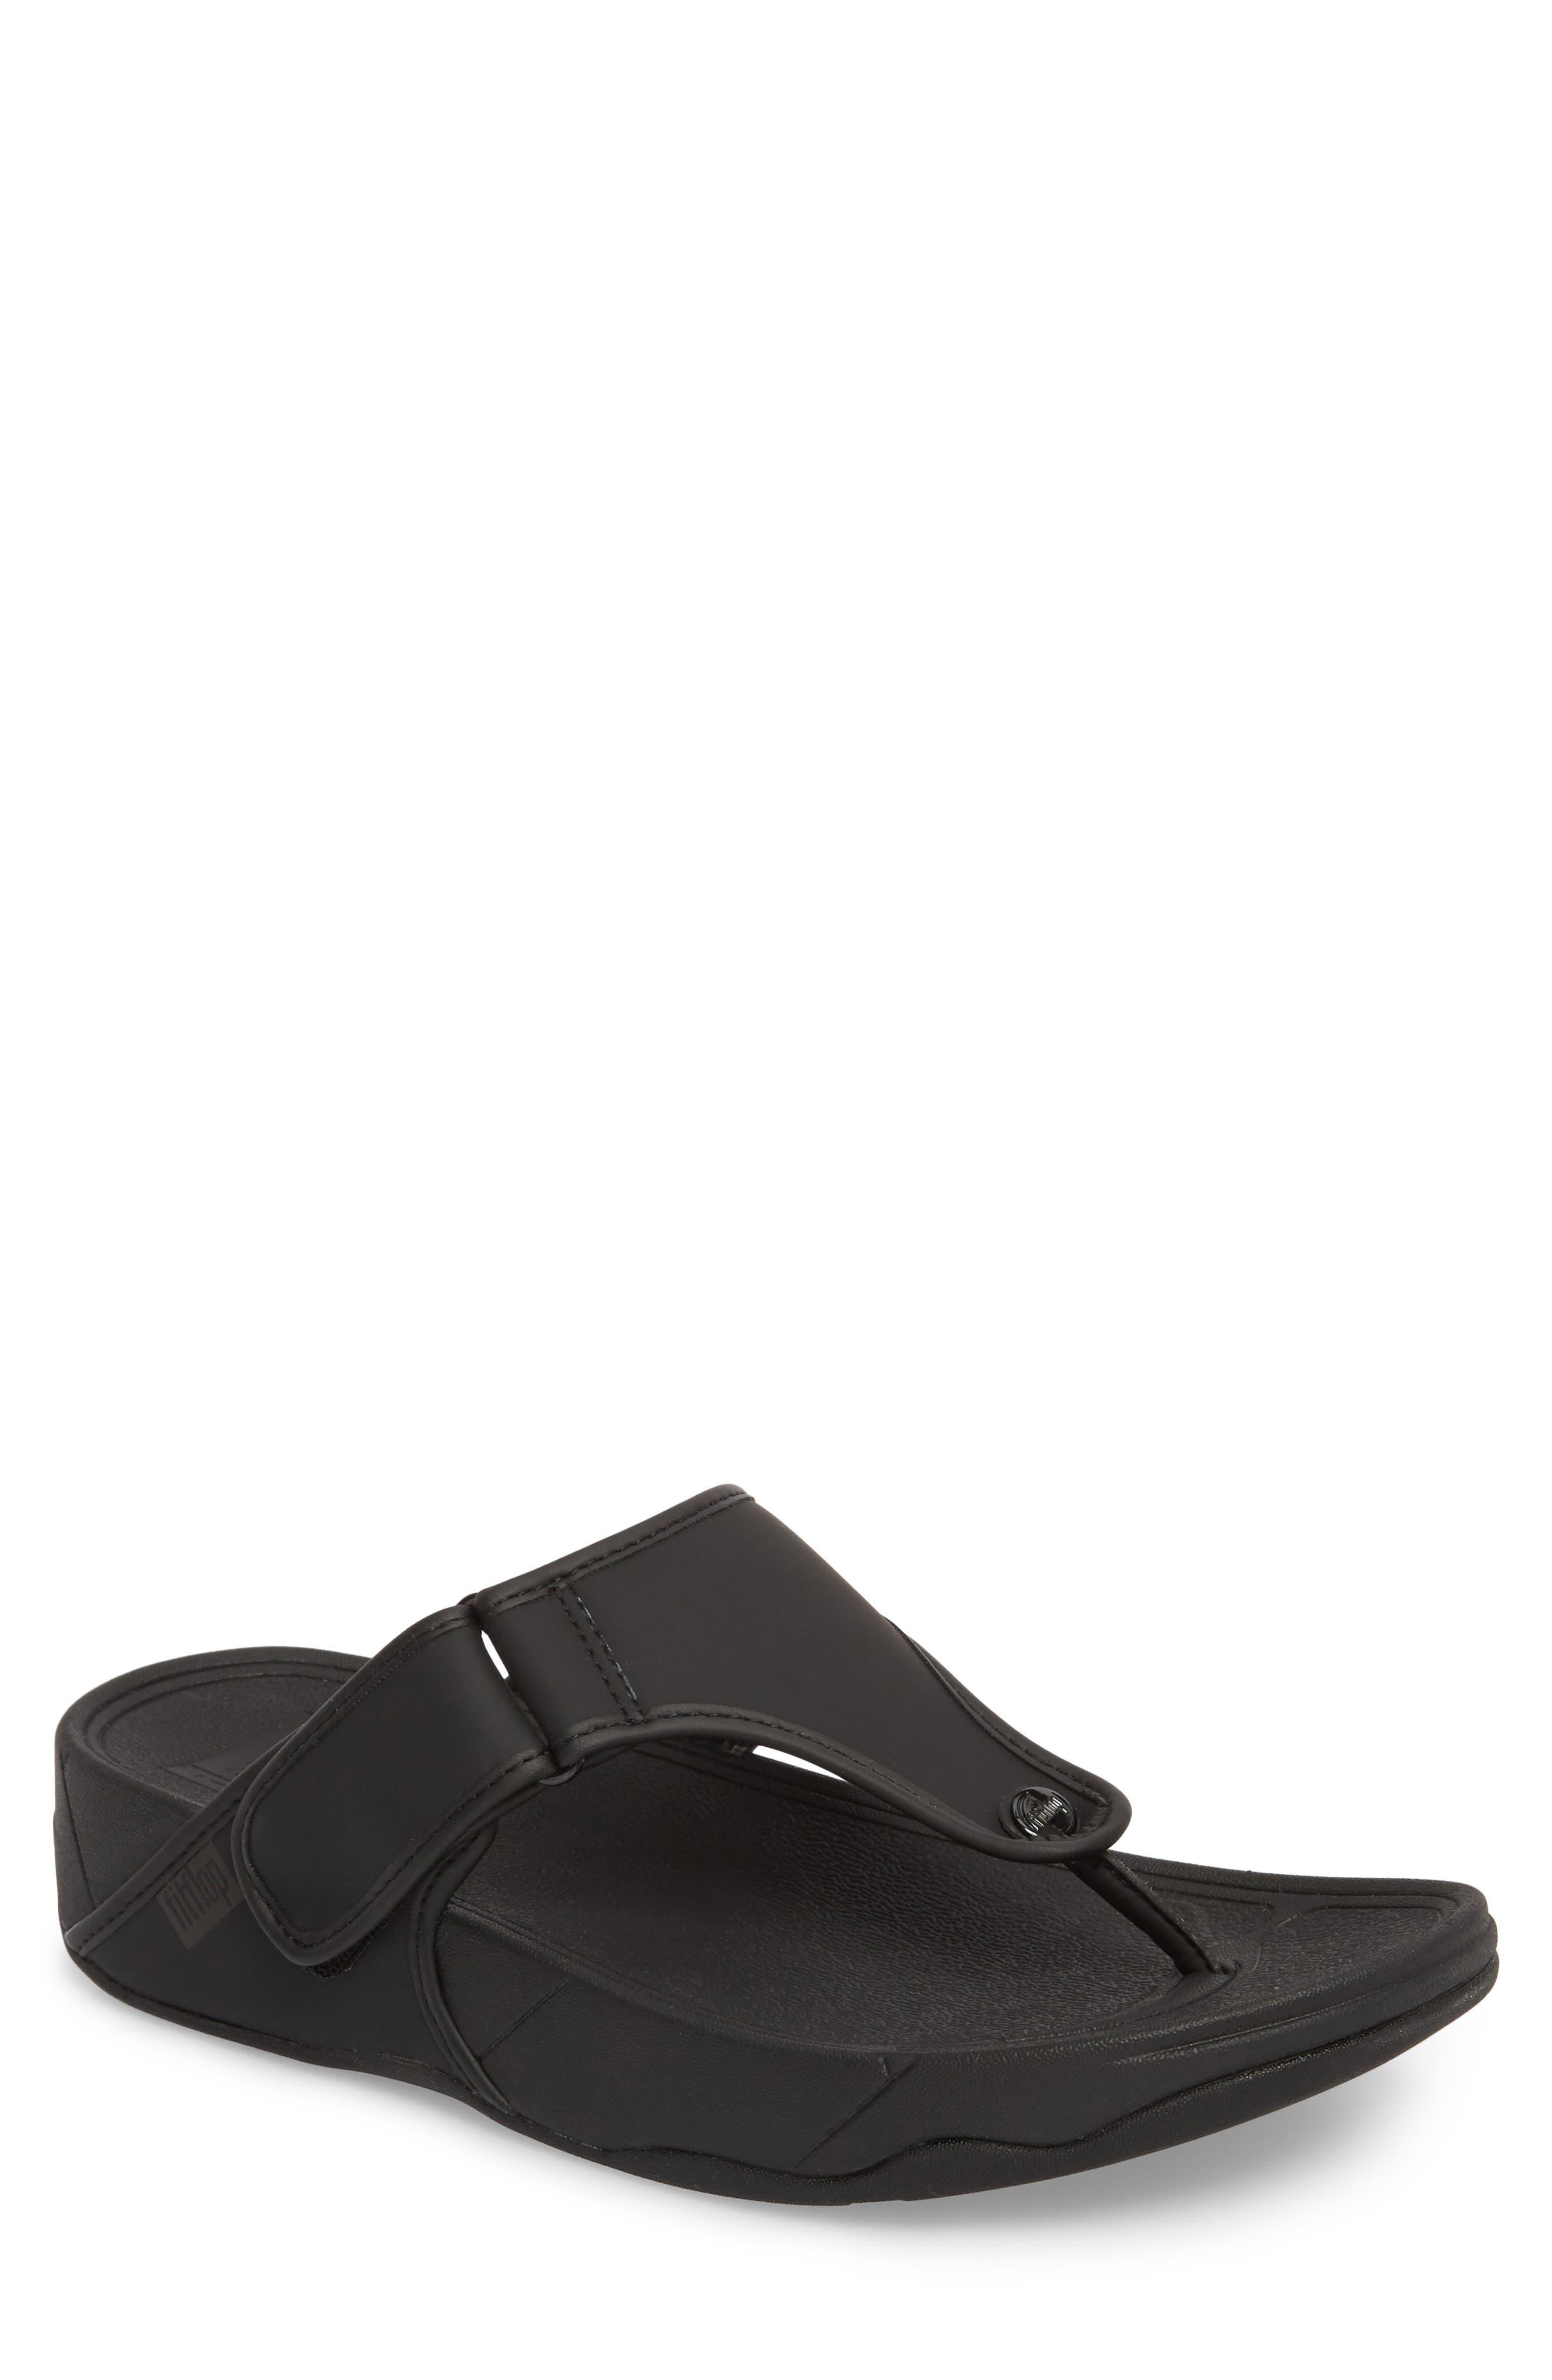 FITFLOP Trakk<sup>™</sup> II Sandal, Main, color, BLACK NEOPRENE